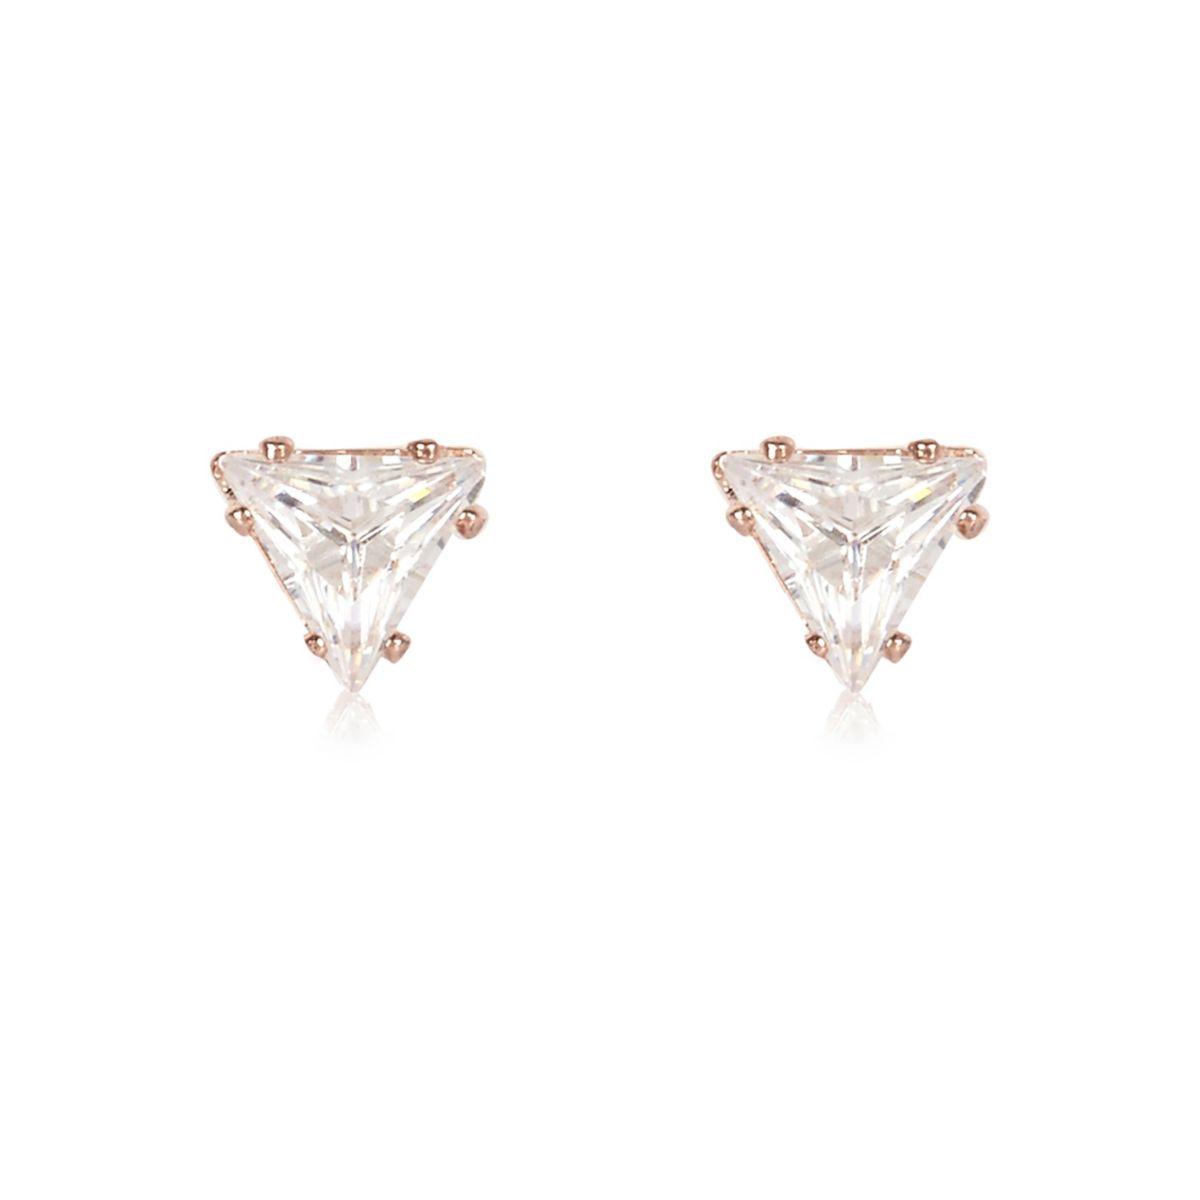 Rose gold tone triangle stud earrings